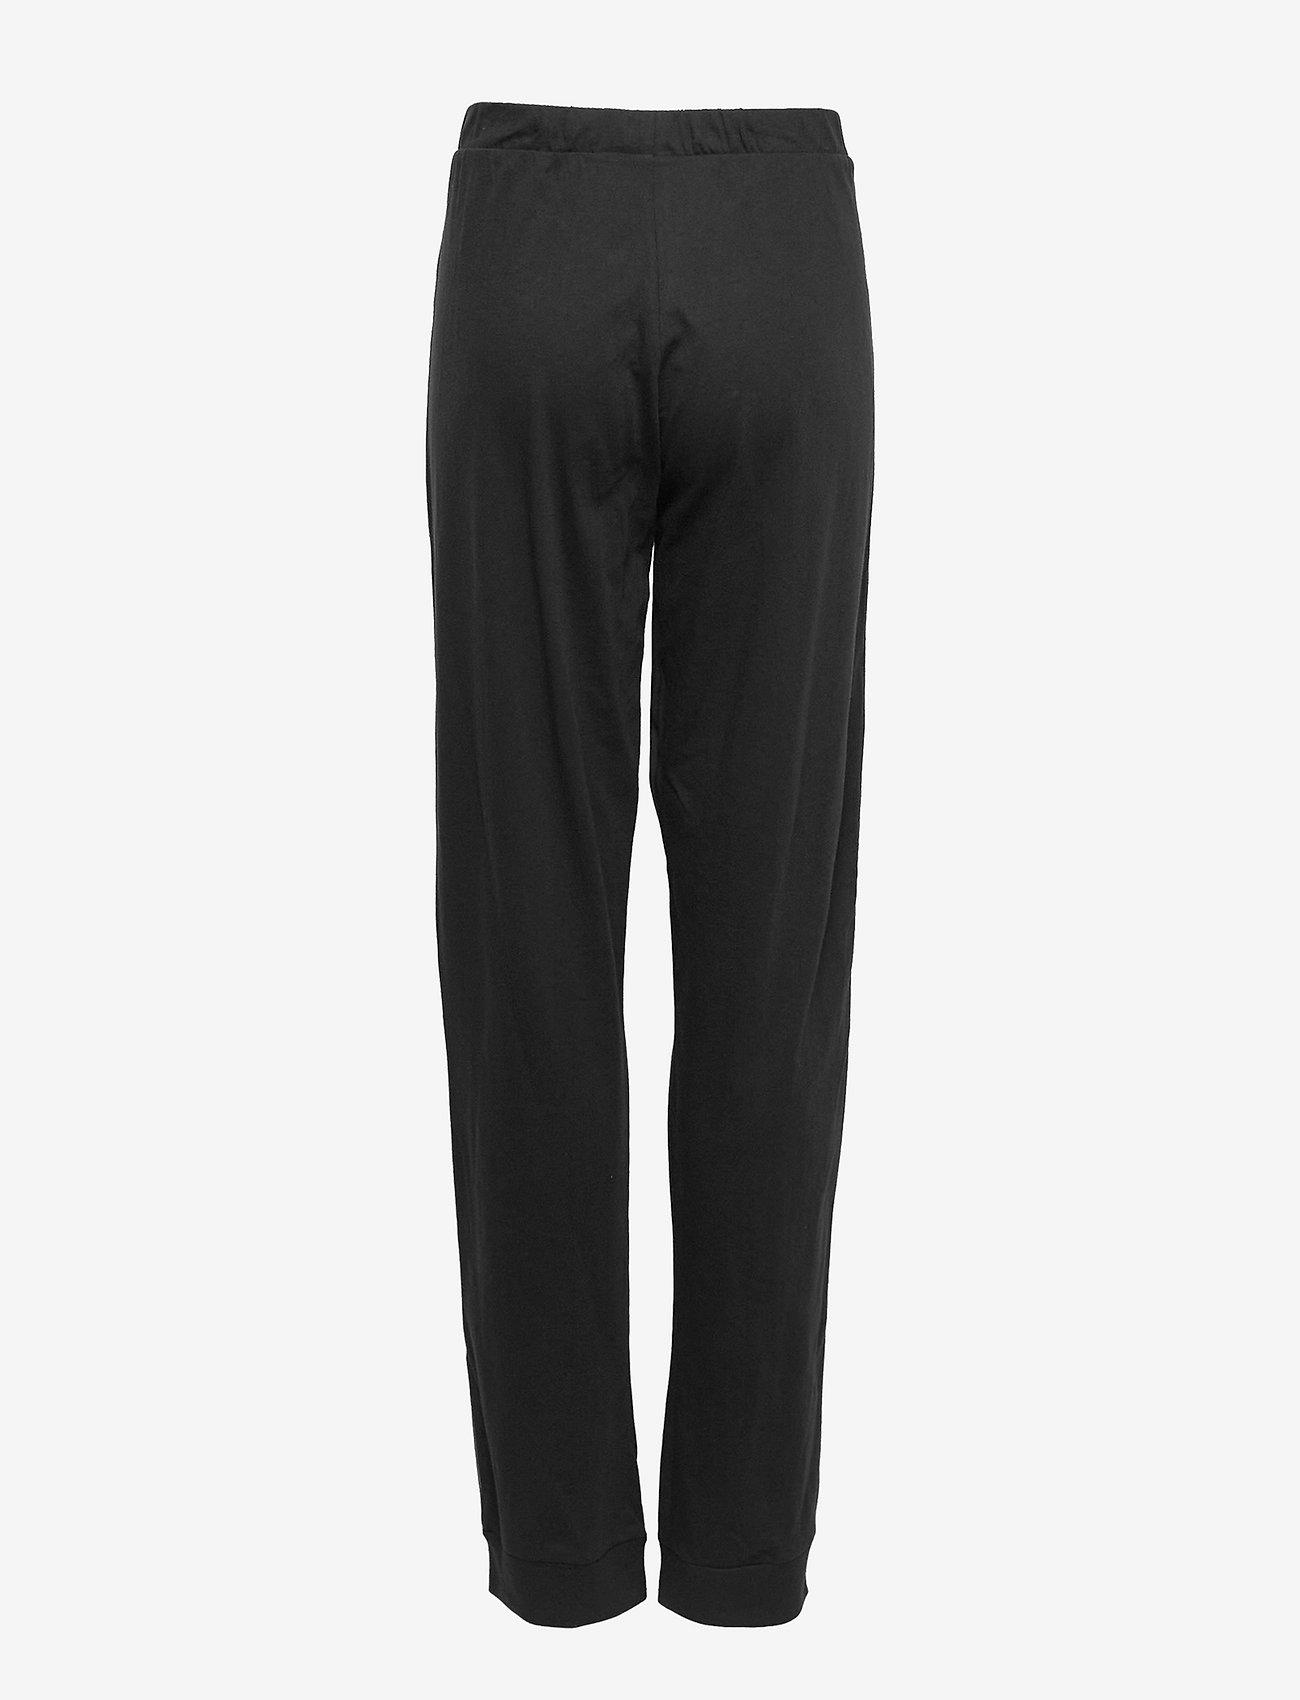 Calvin Klein - KNIT PJ SET (SS+CUFFED PANT) - sæt - pvh black - 5